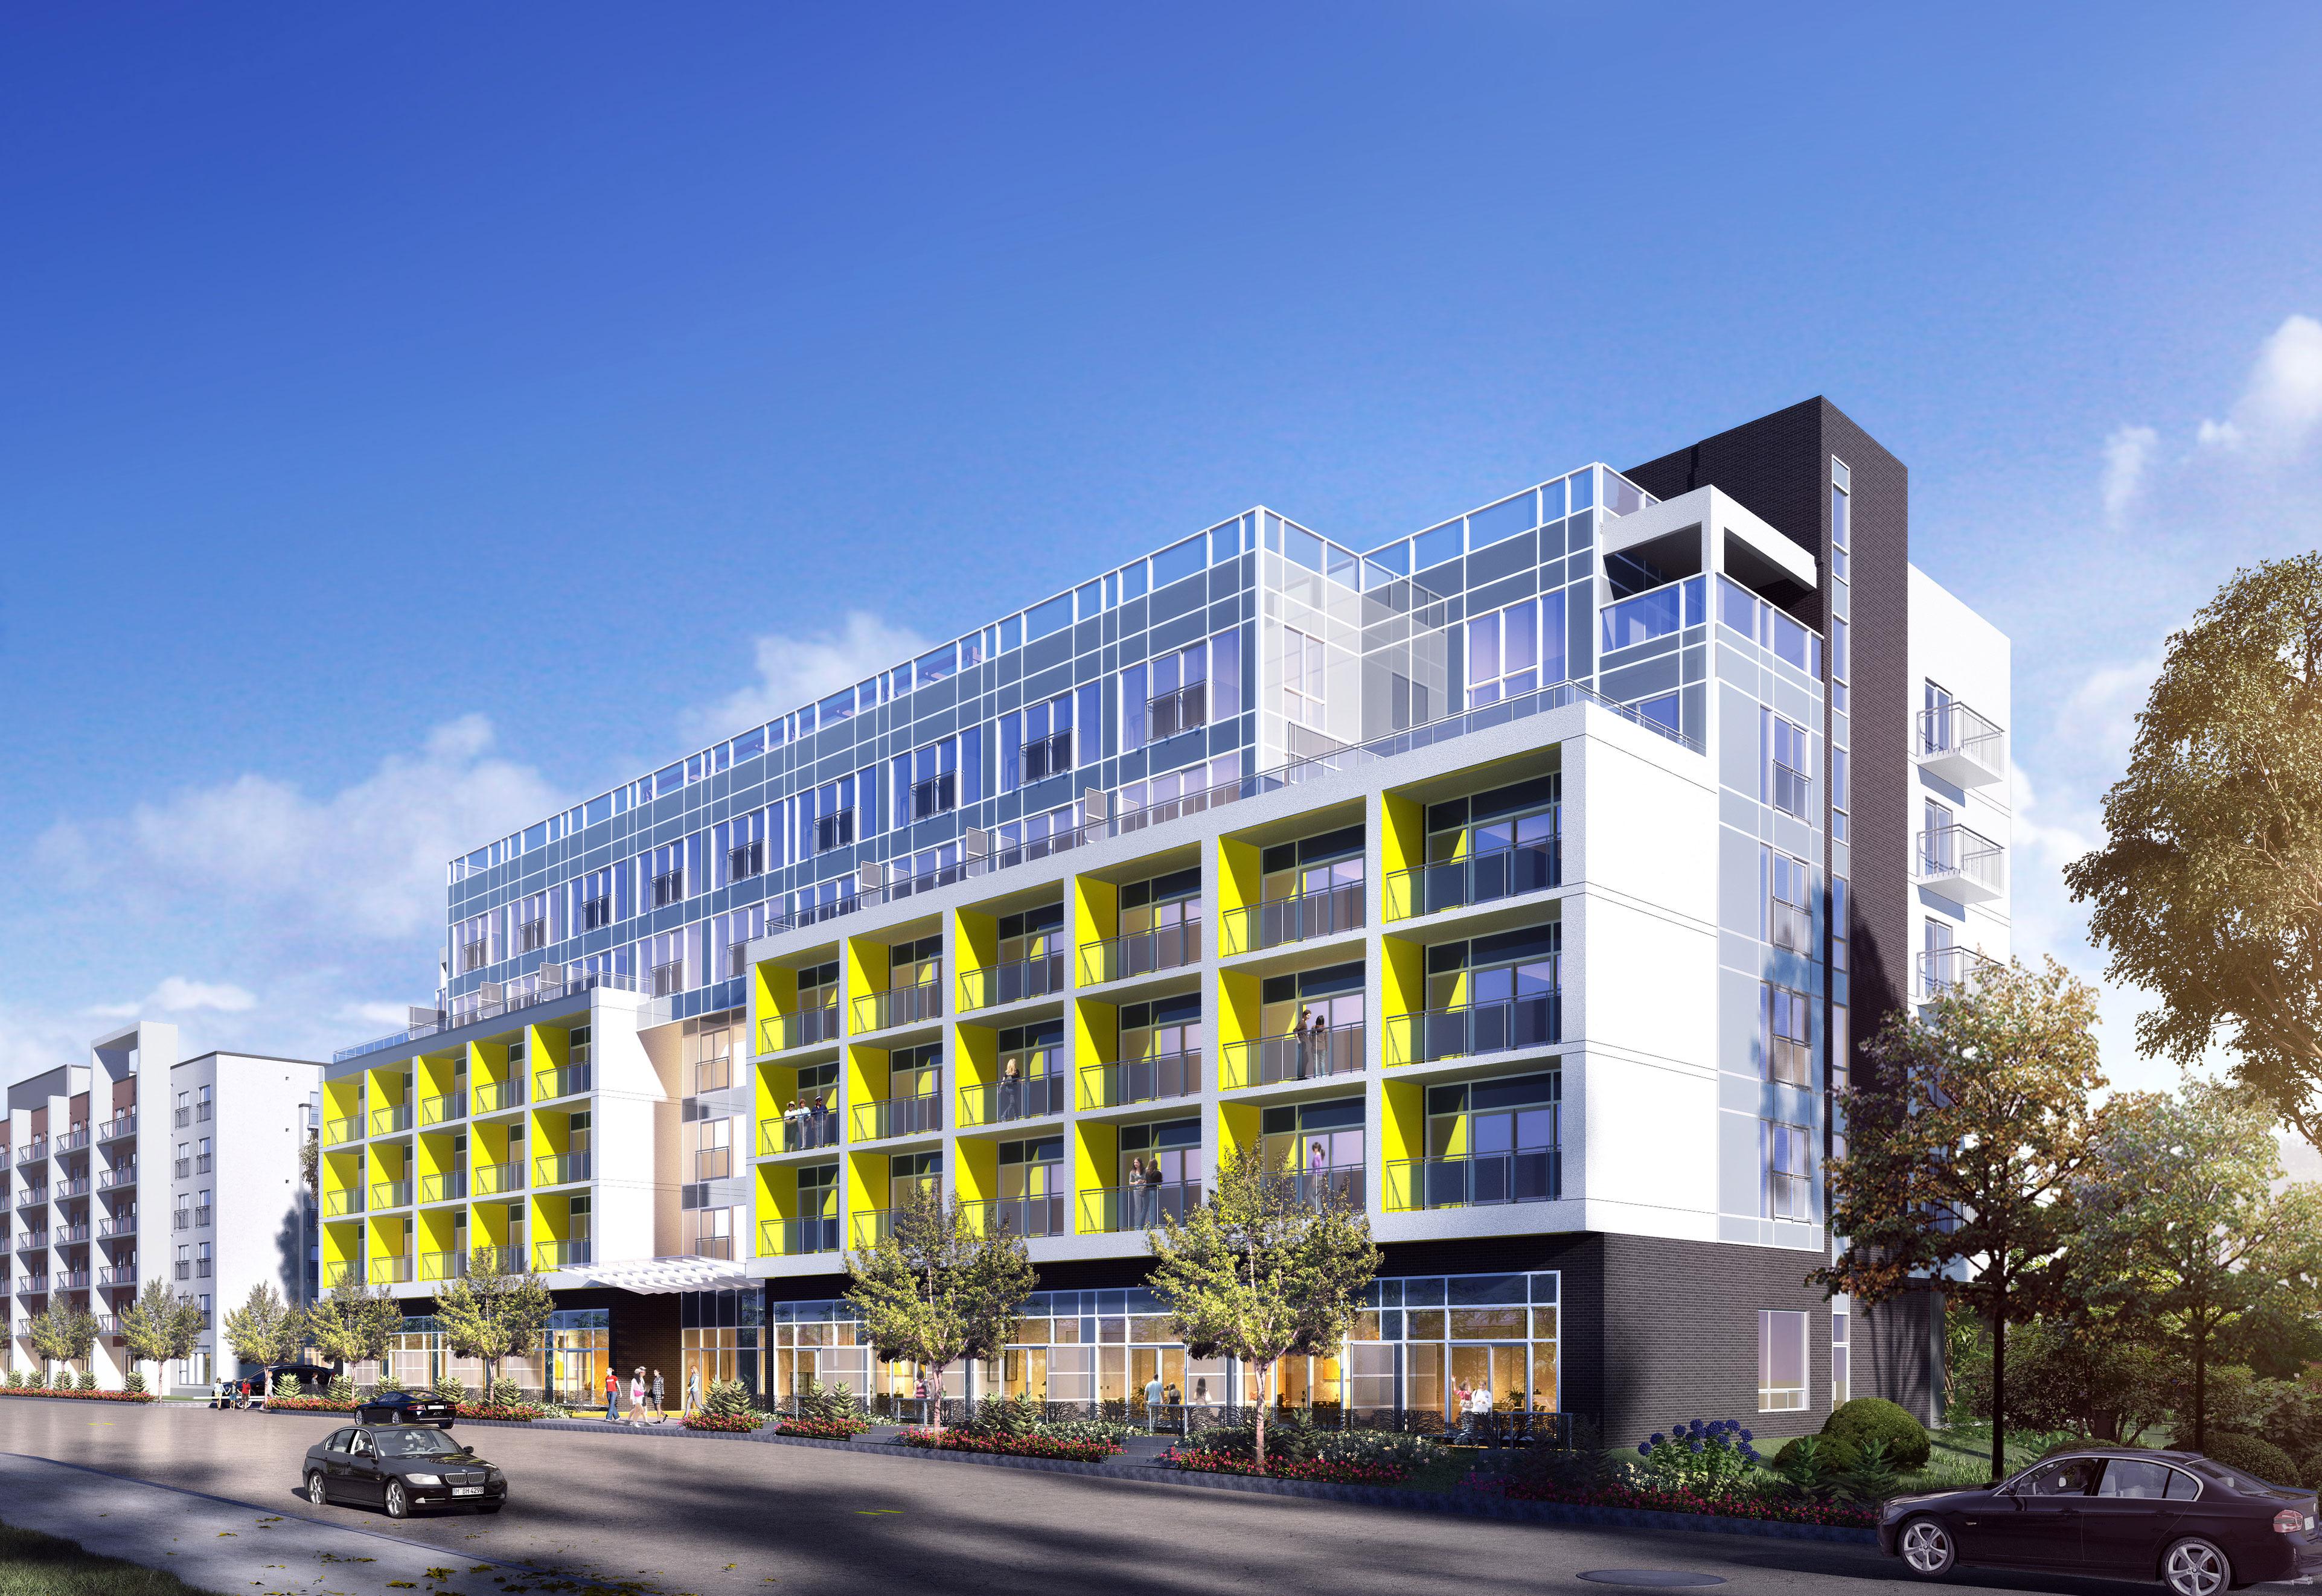 New Condos at University Ave W & Albert St, Waterloo